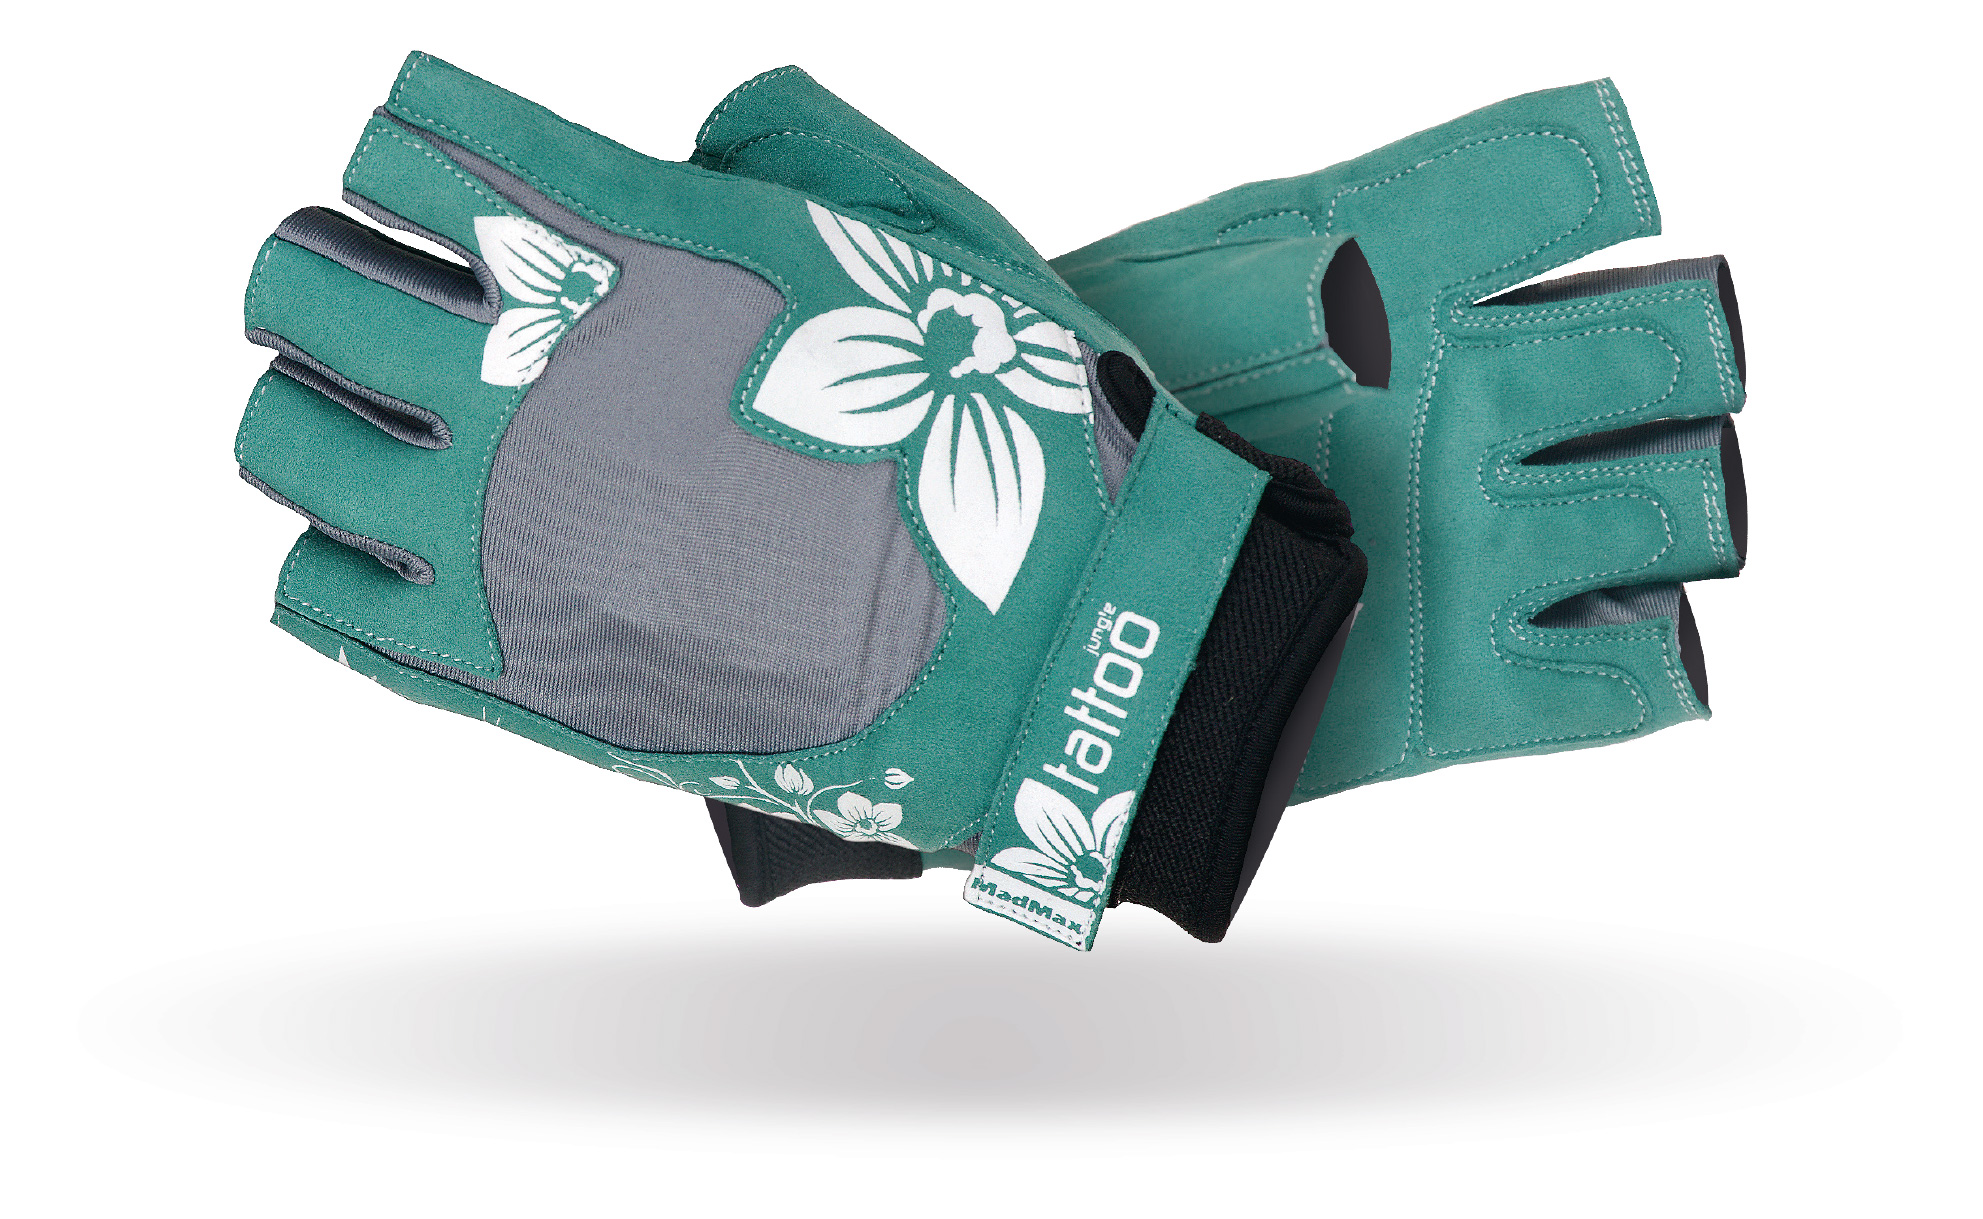 MAD MAX MFG-710 jungle gloves